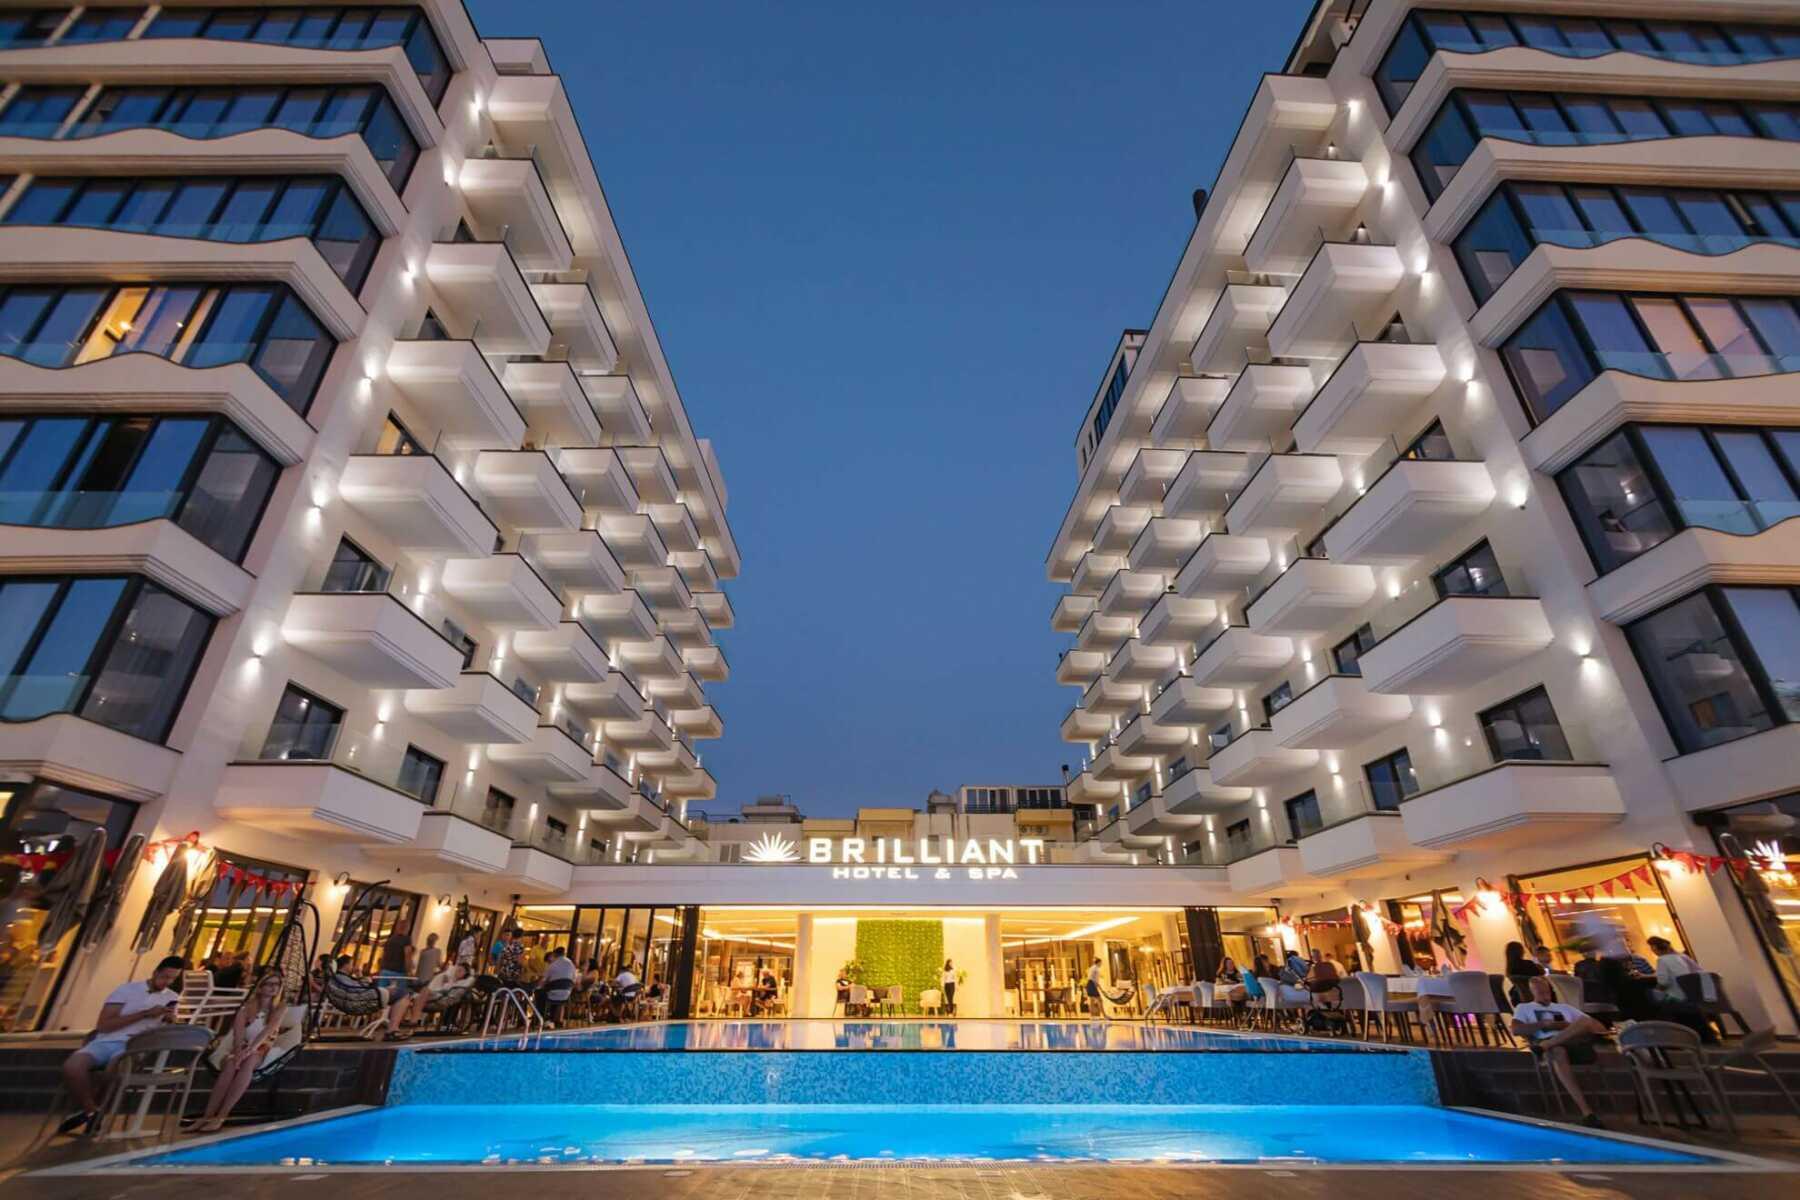 Hotel Brilliant Albania-Jumbo Travel-overview